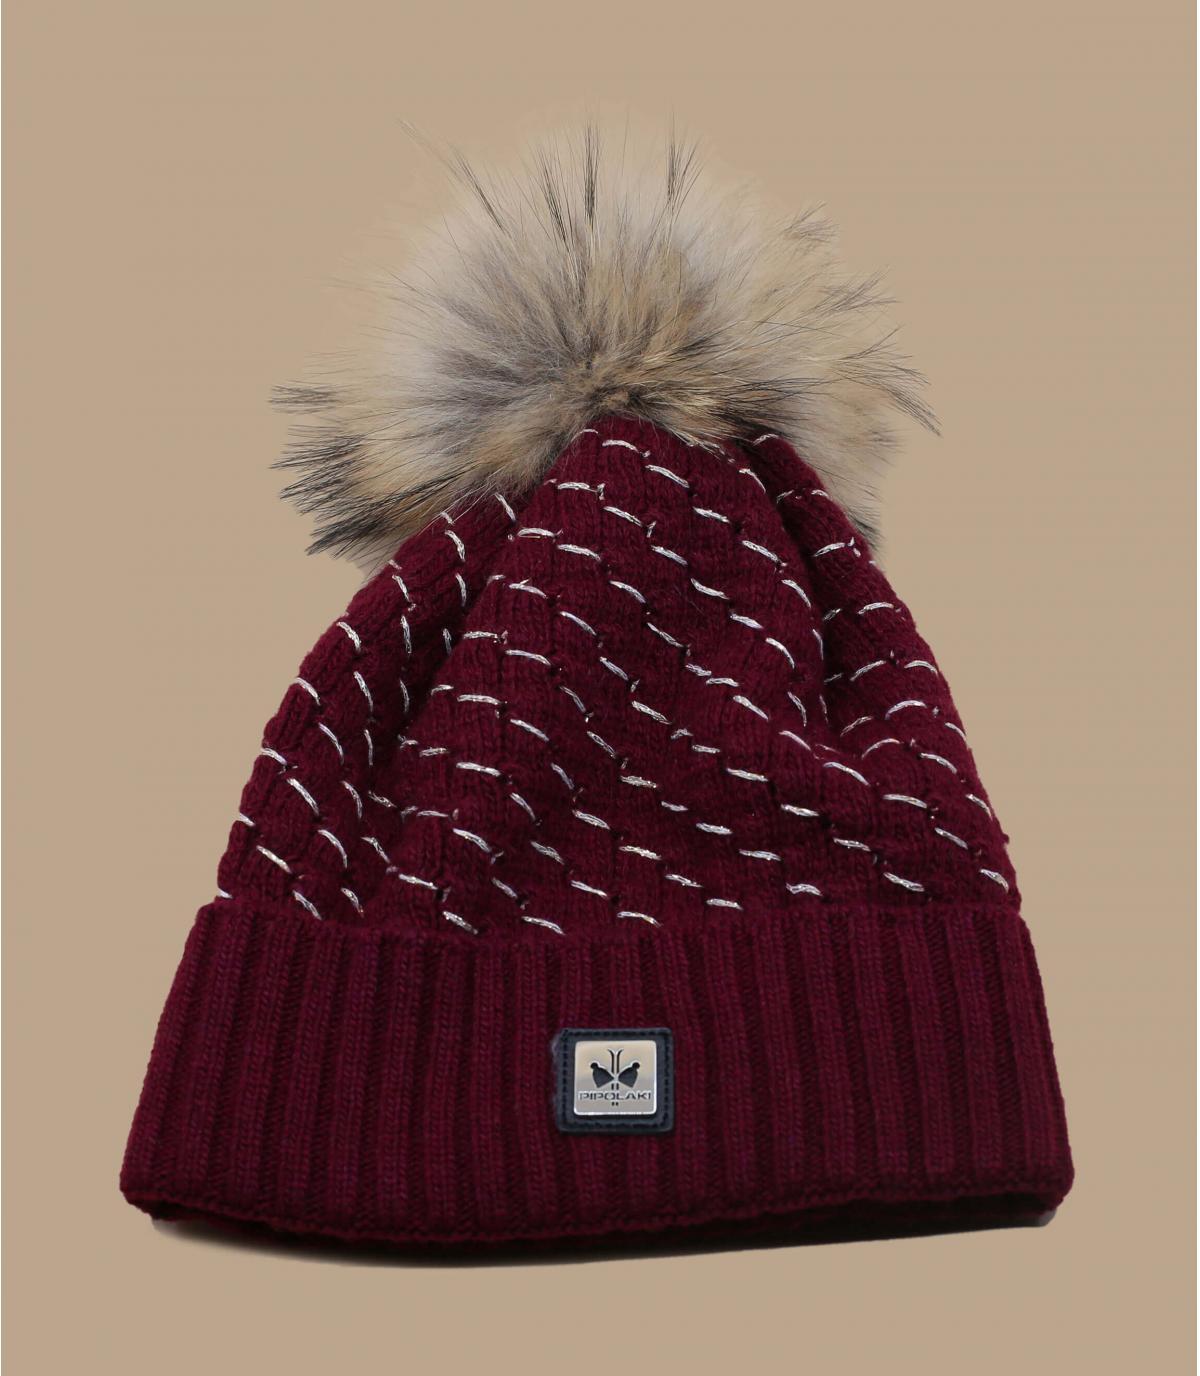 Mütze bordeaux Kaschmir Fell